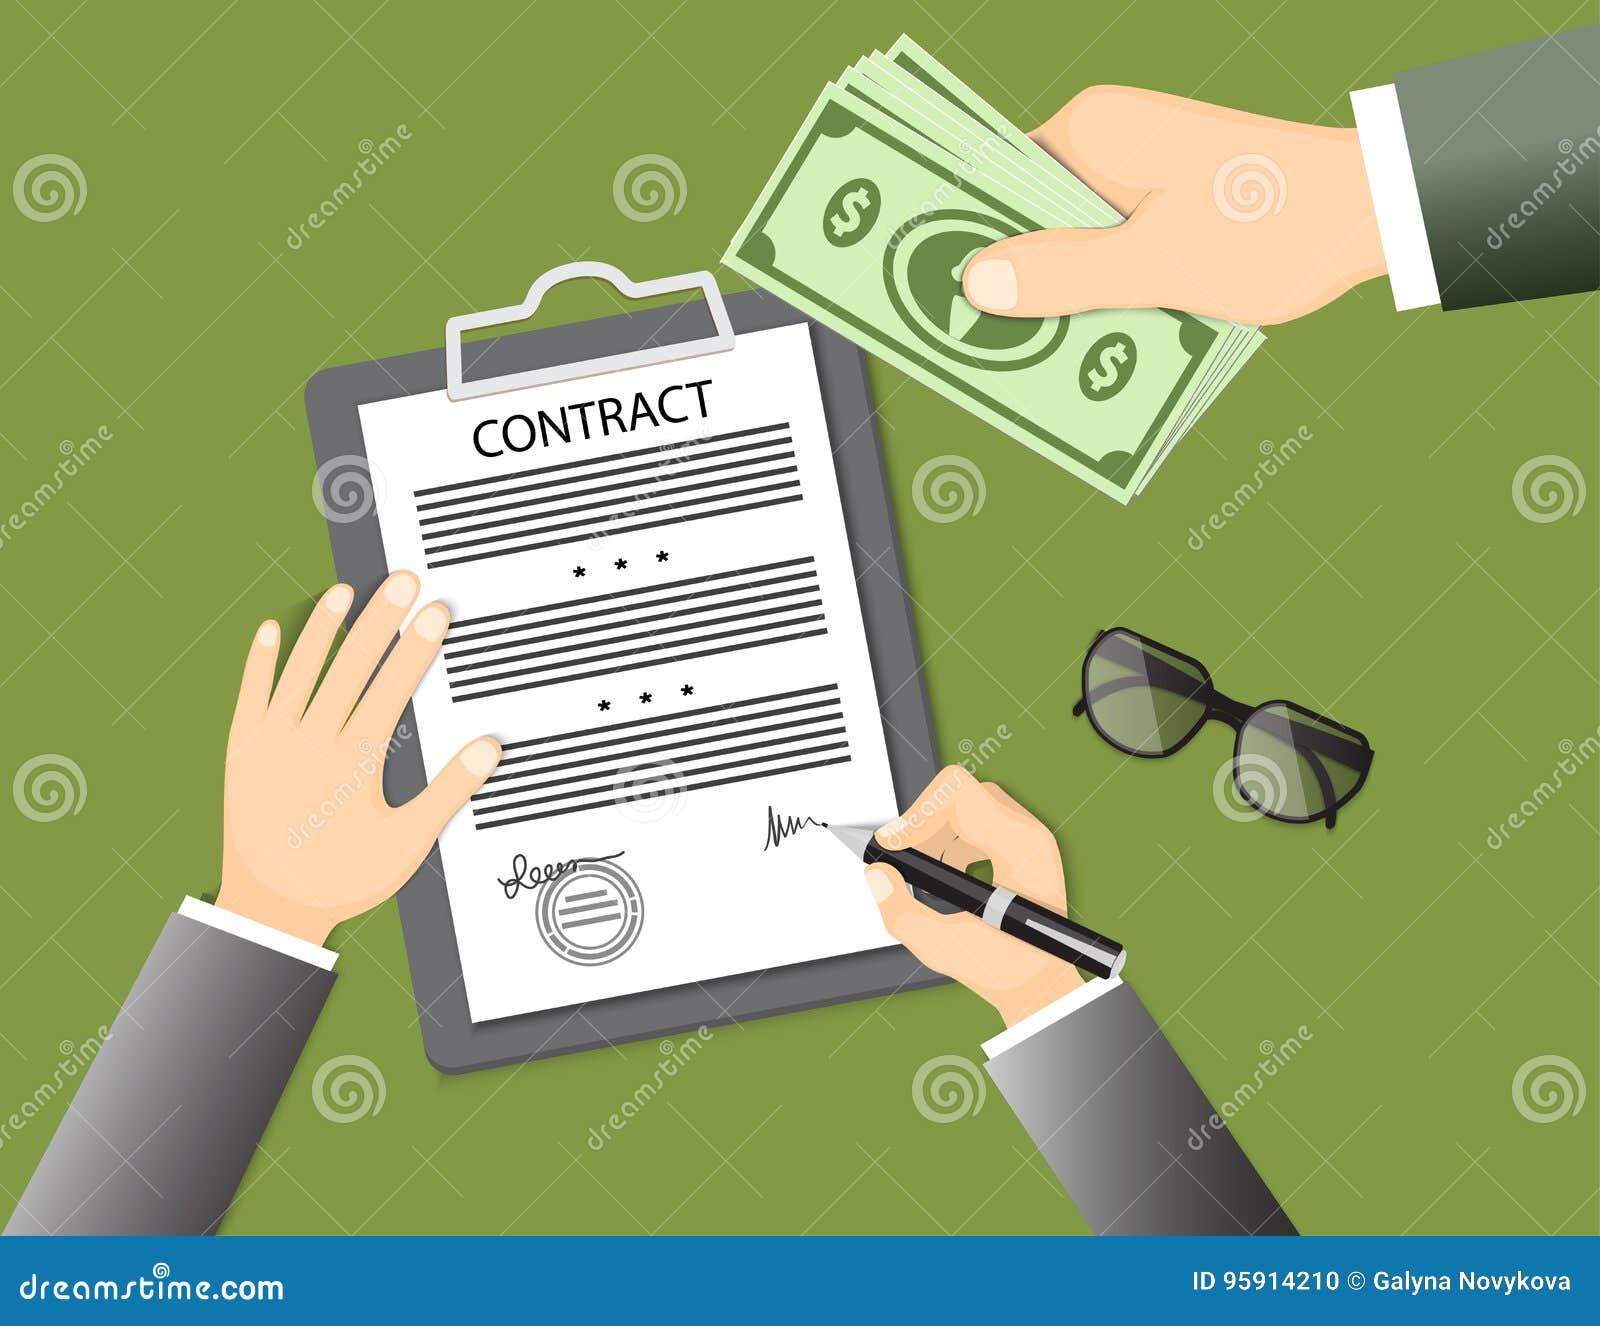 Contrat de signature avec les verres et la main donnant des billets de banque